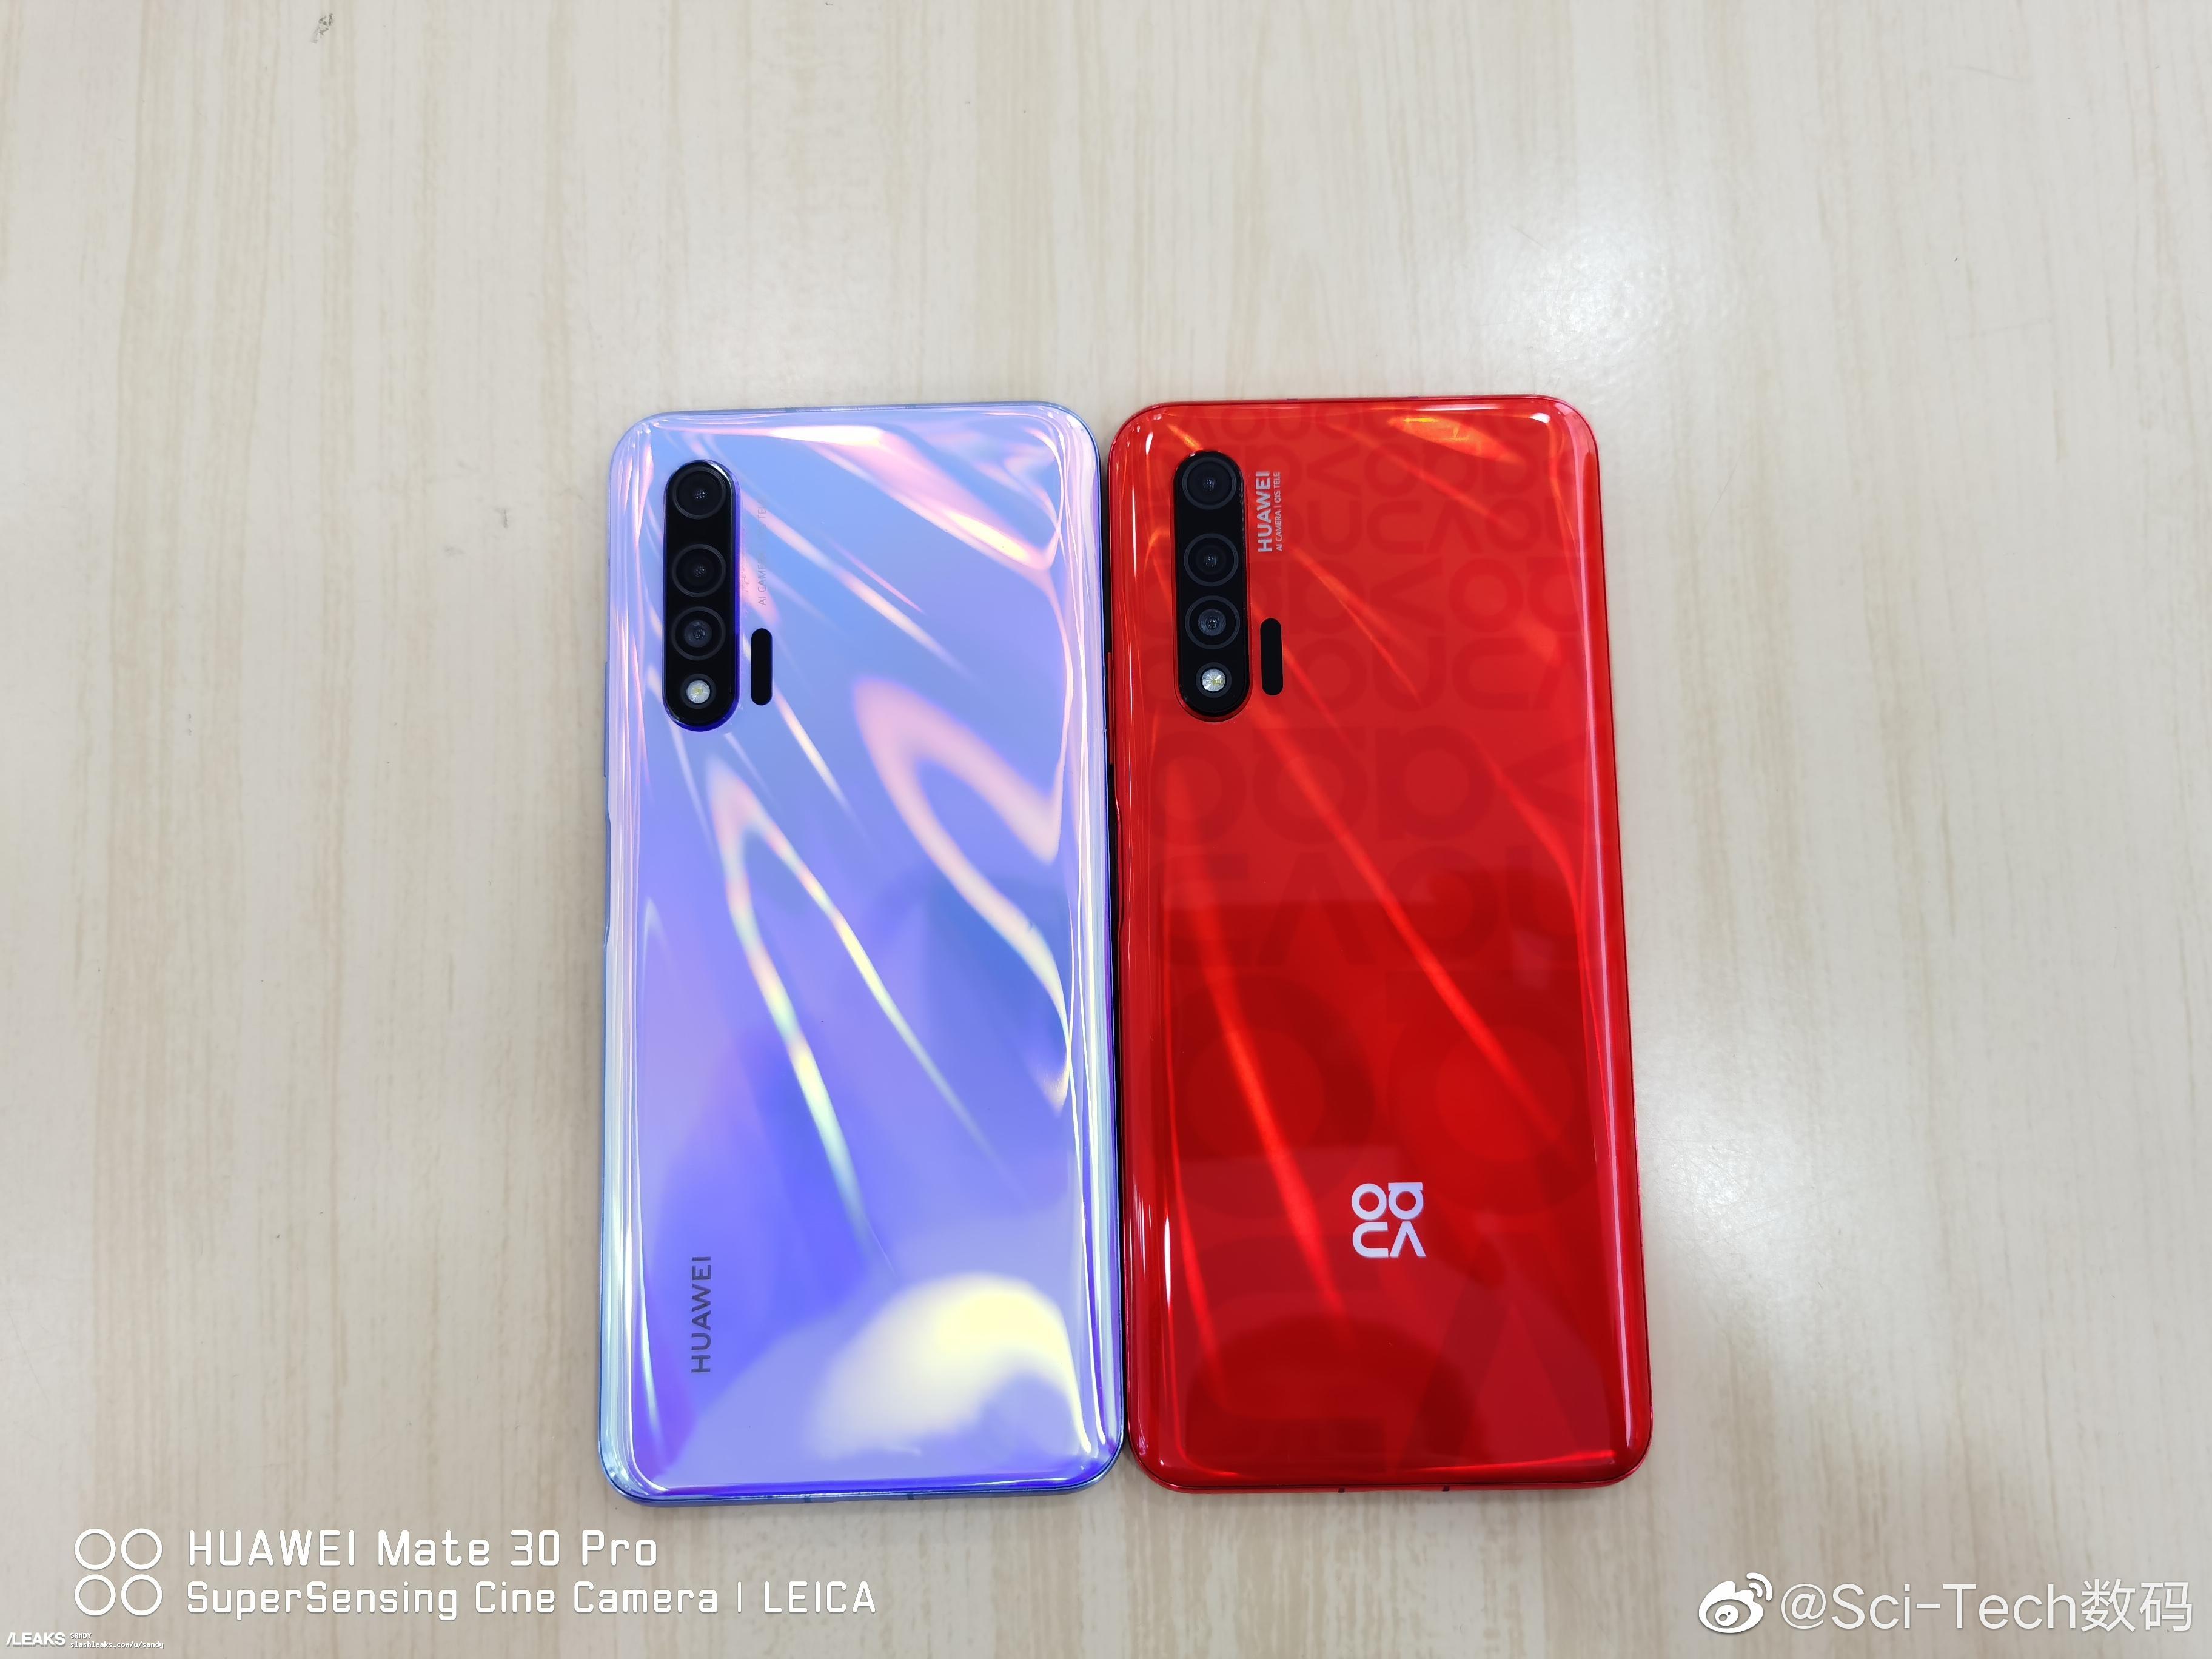 img Nova 6/Nova 6 5G in Honey Red and Provence colors